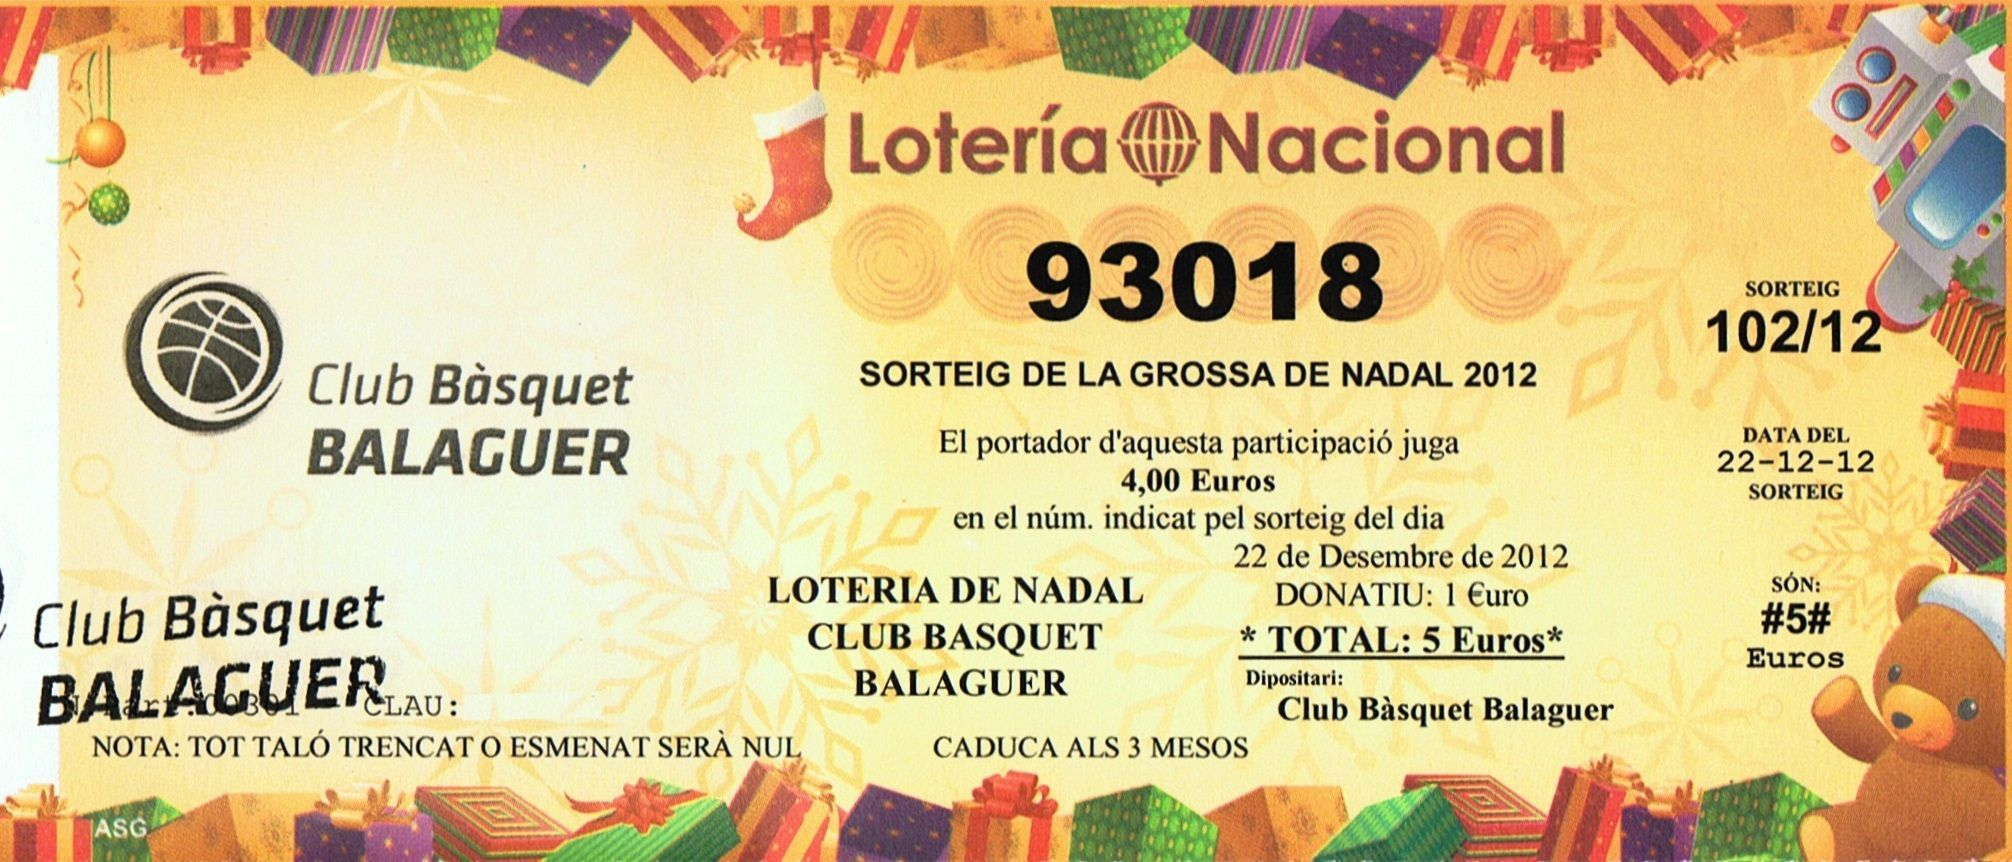 loteria club